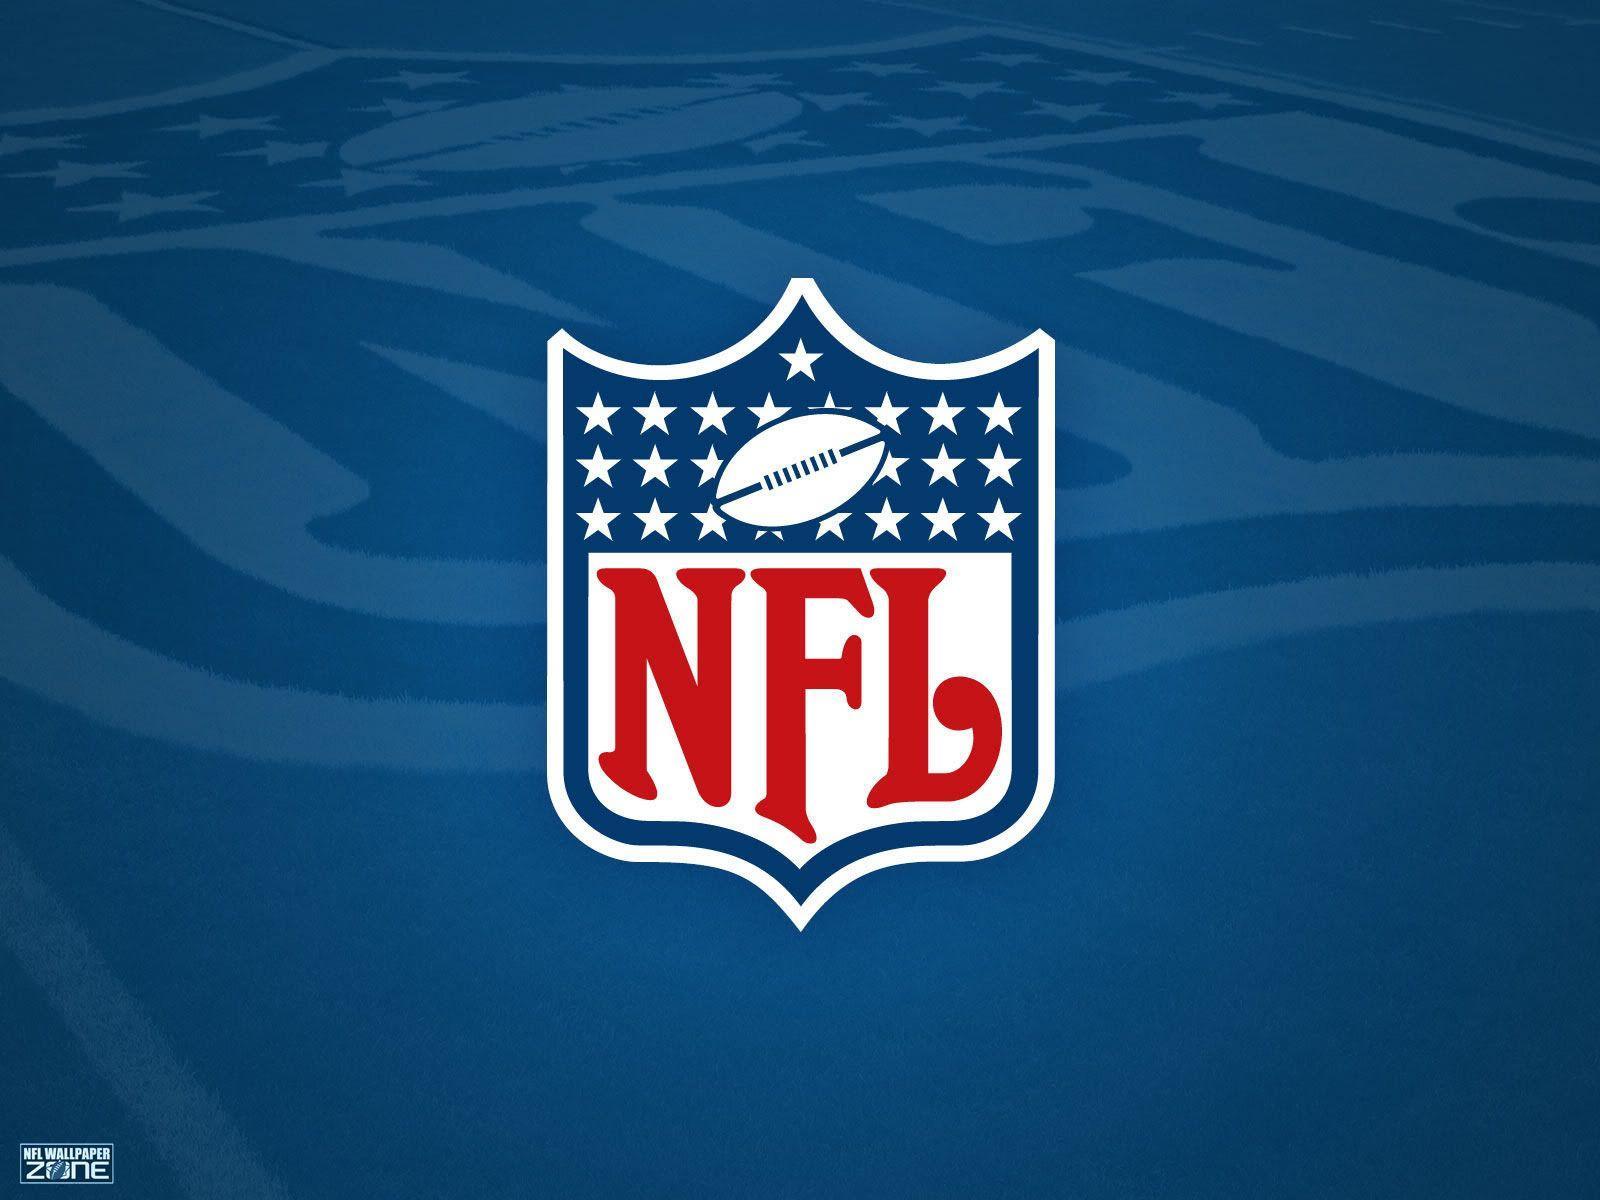 NFL Wallpaper Photo by NFLWallpaperZone | Photobucket